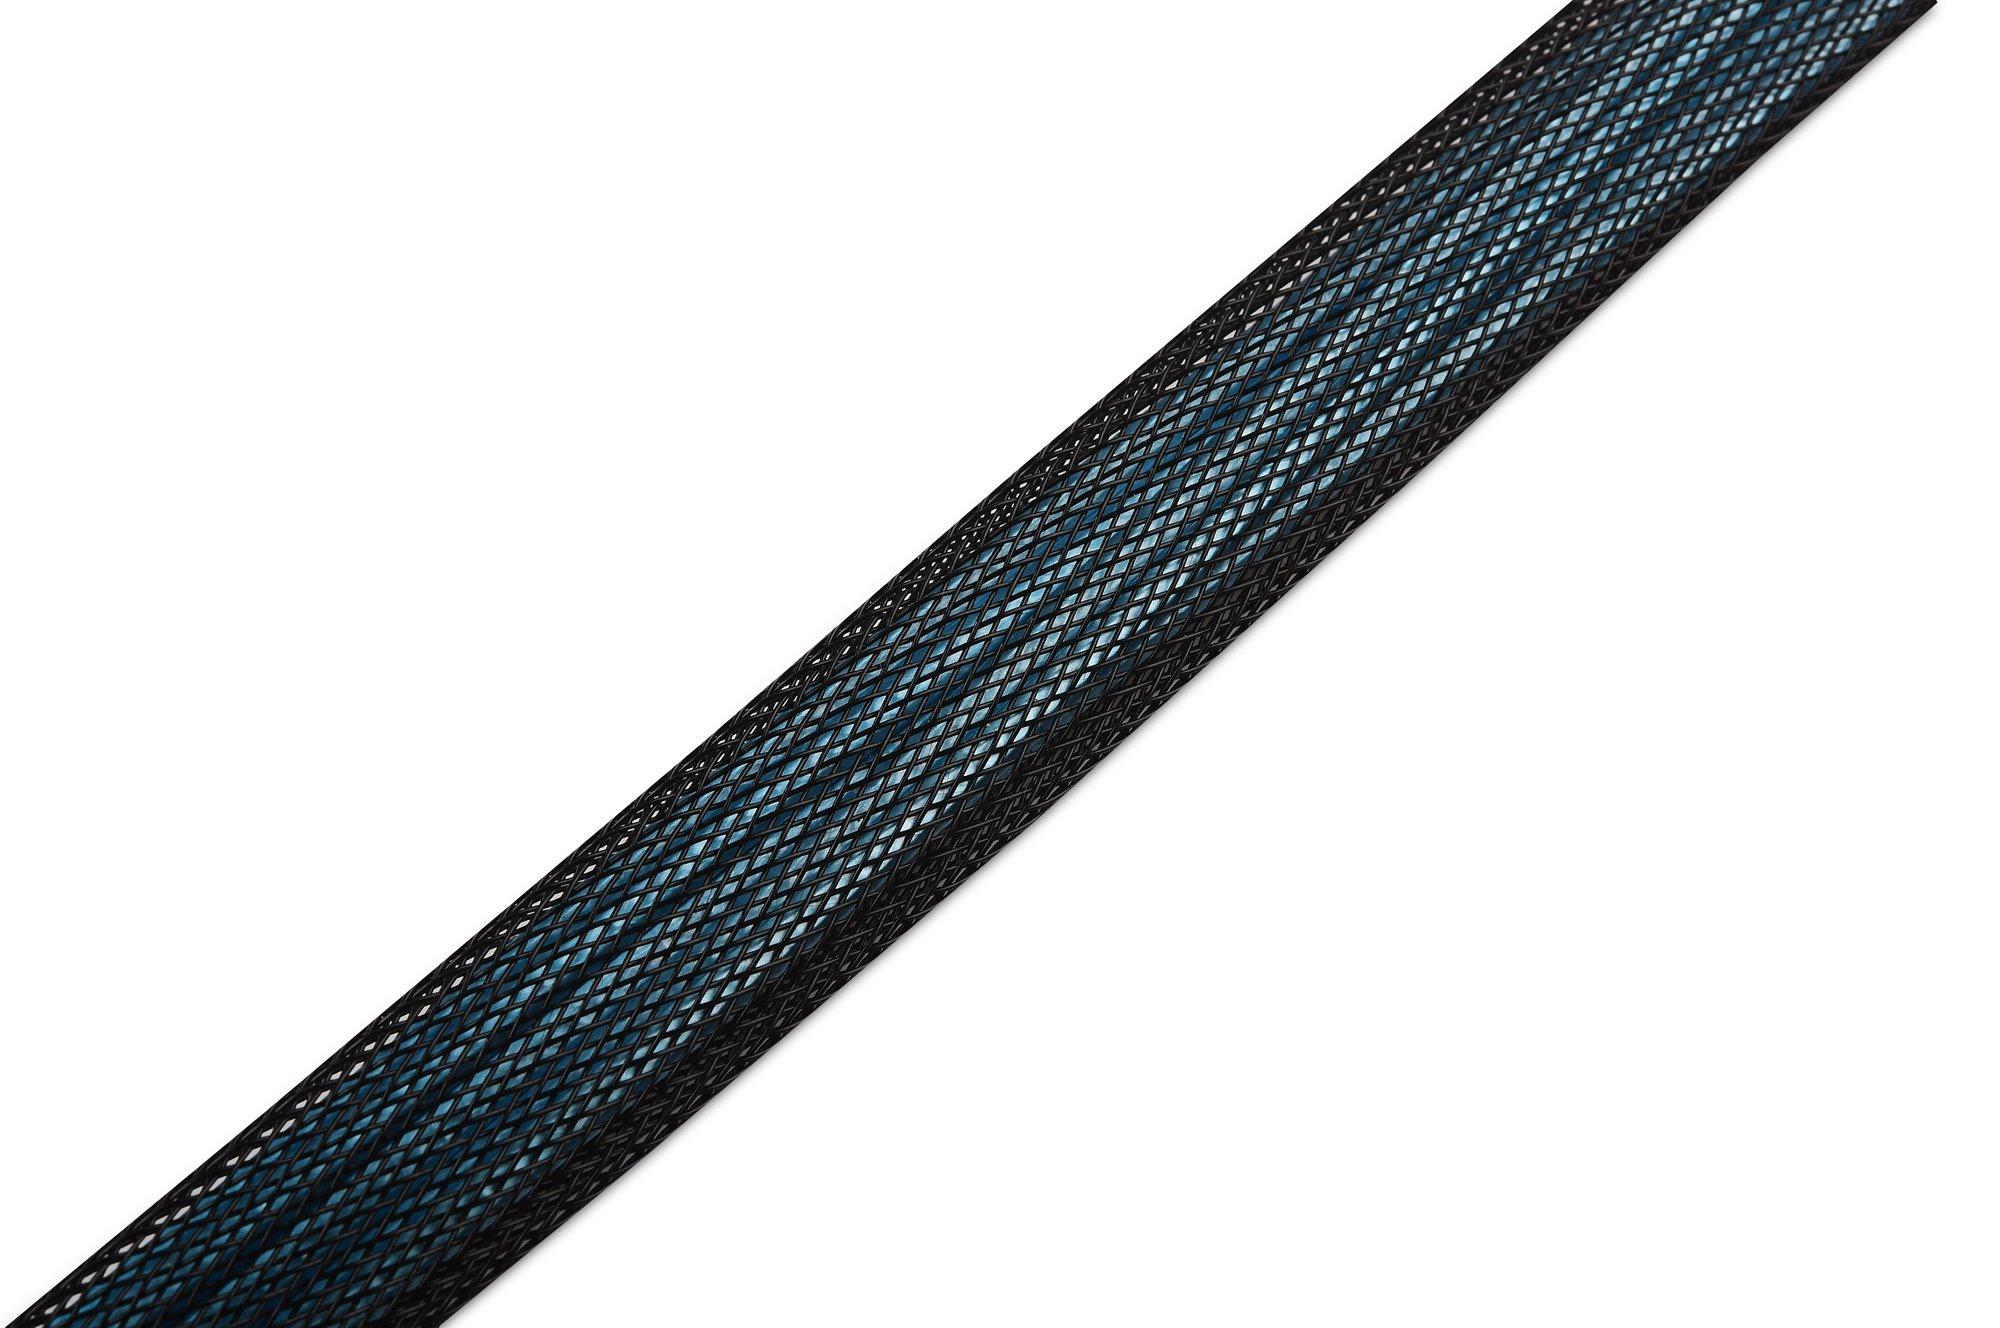 Cable Matters Internal Mini SAS to Mini SAS Cable (Mini-SAS to Mini-SAS Cable) 3.3 Feet/1m by Cable Matters (Image #5)